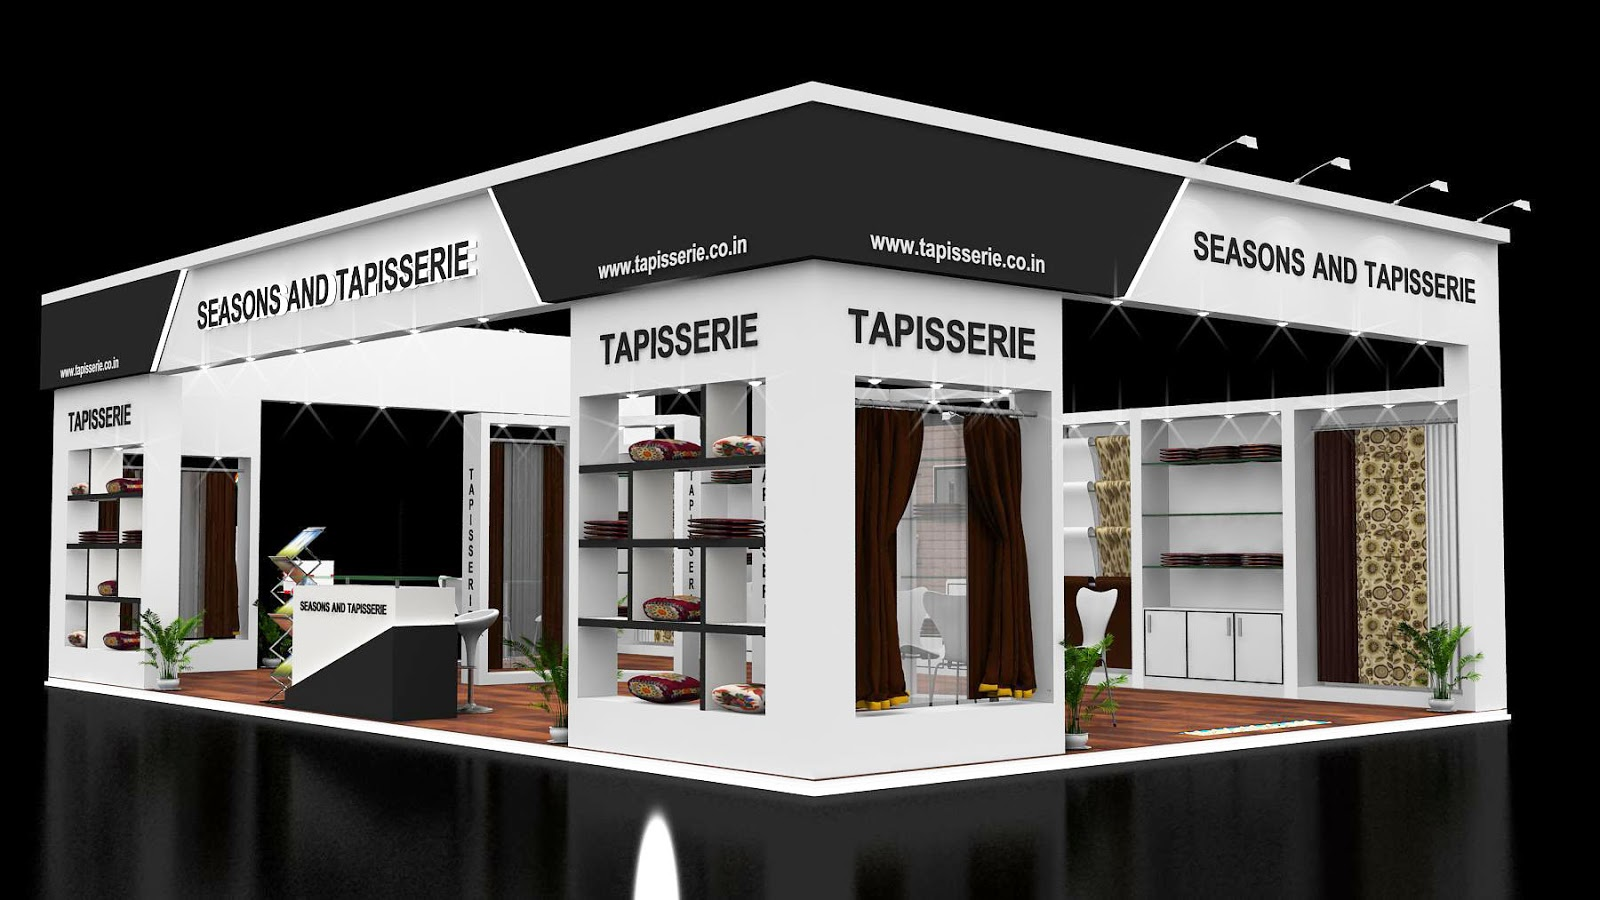 Exhibition Stall Arrangements : Custom exhibition stall design in dubai